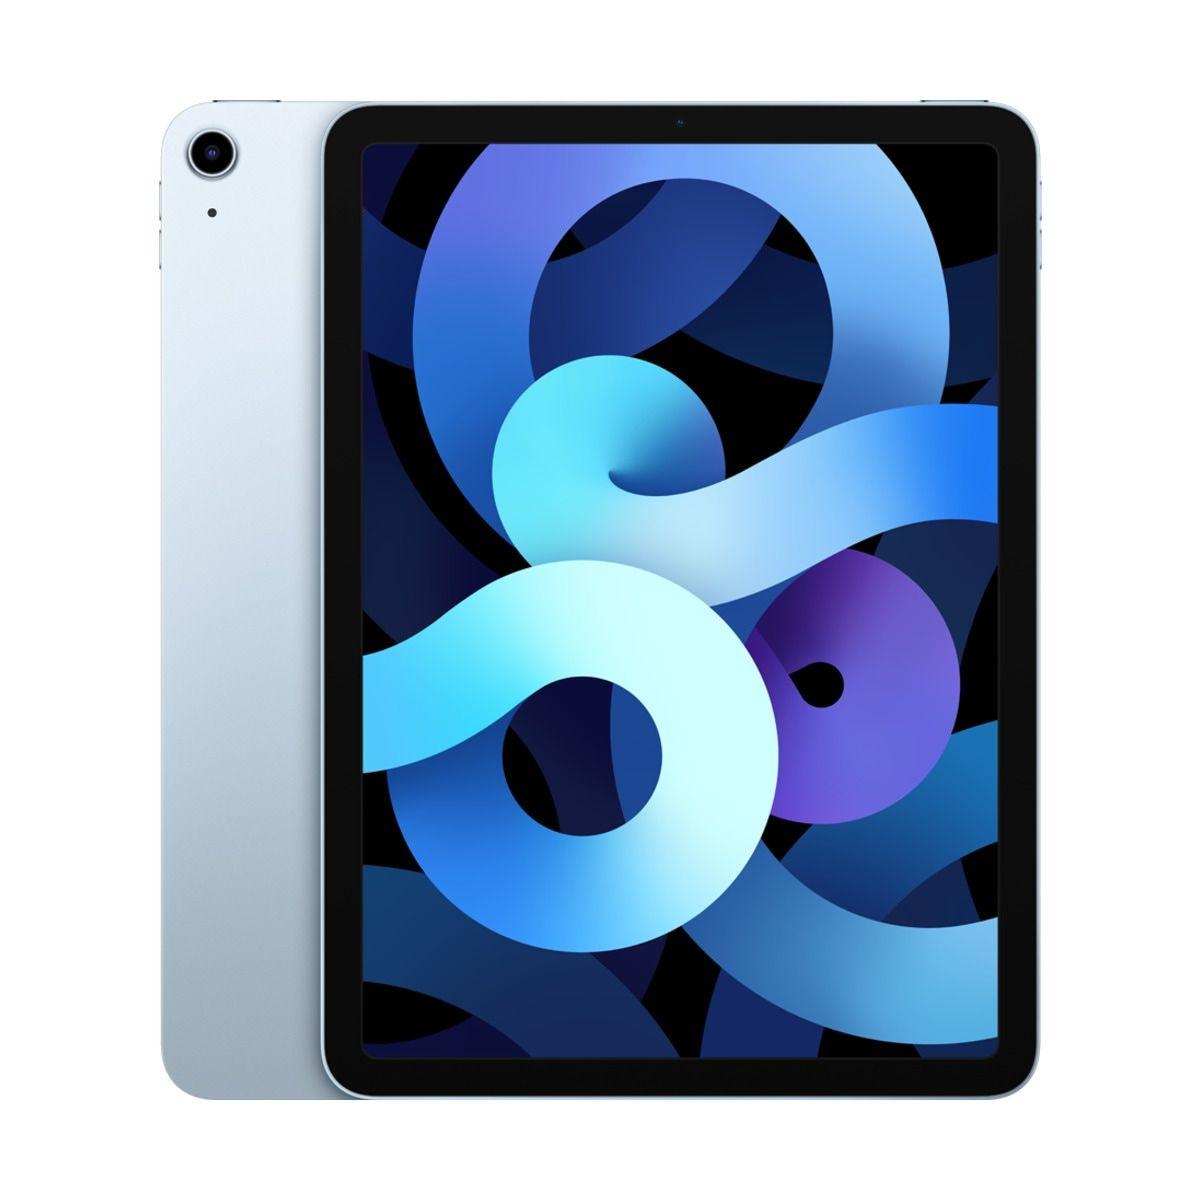 Apple iPad Air Wi-Fi + Cell 256GB - Sky Blue / SK - MYH62FD/A